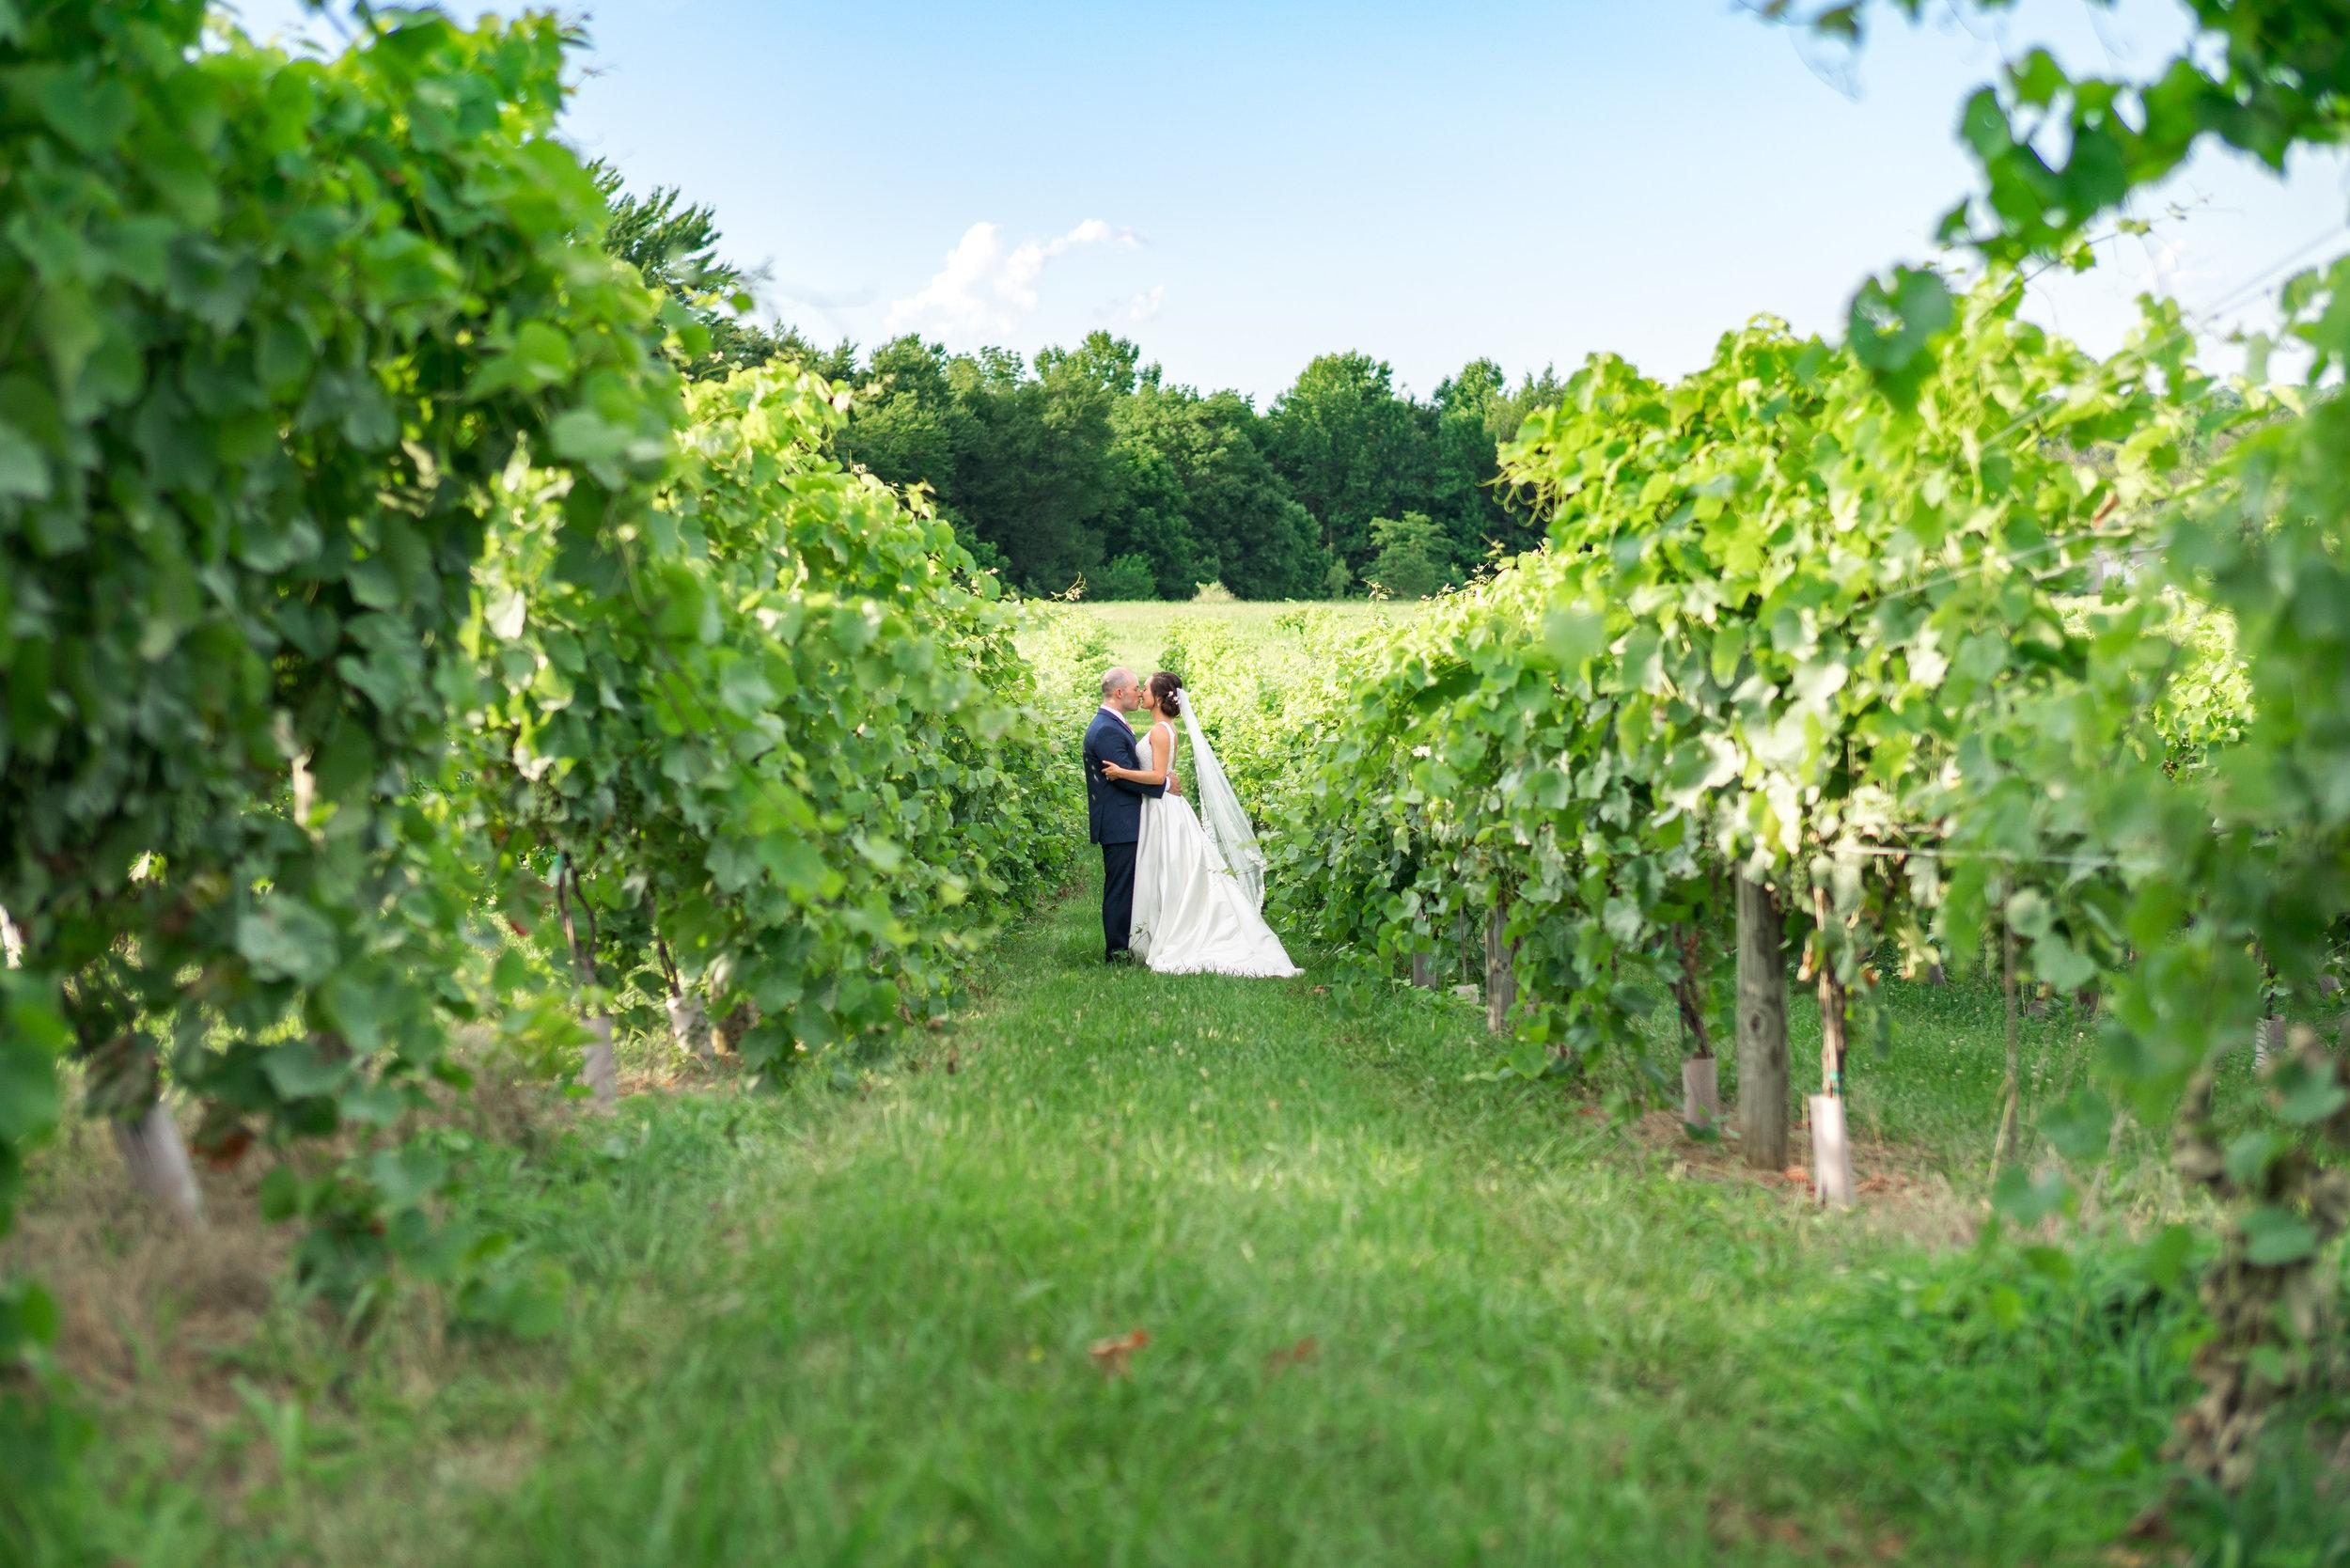 Springfield Manor vineyard wedding photos in maryland by jessica nazarova